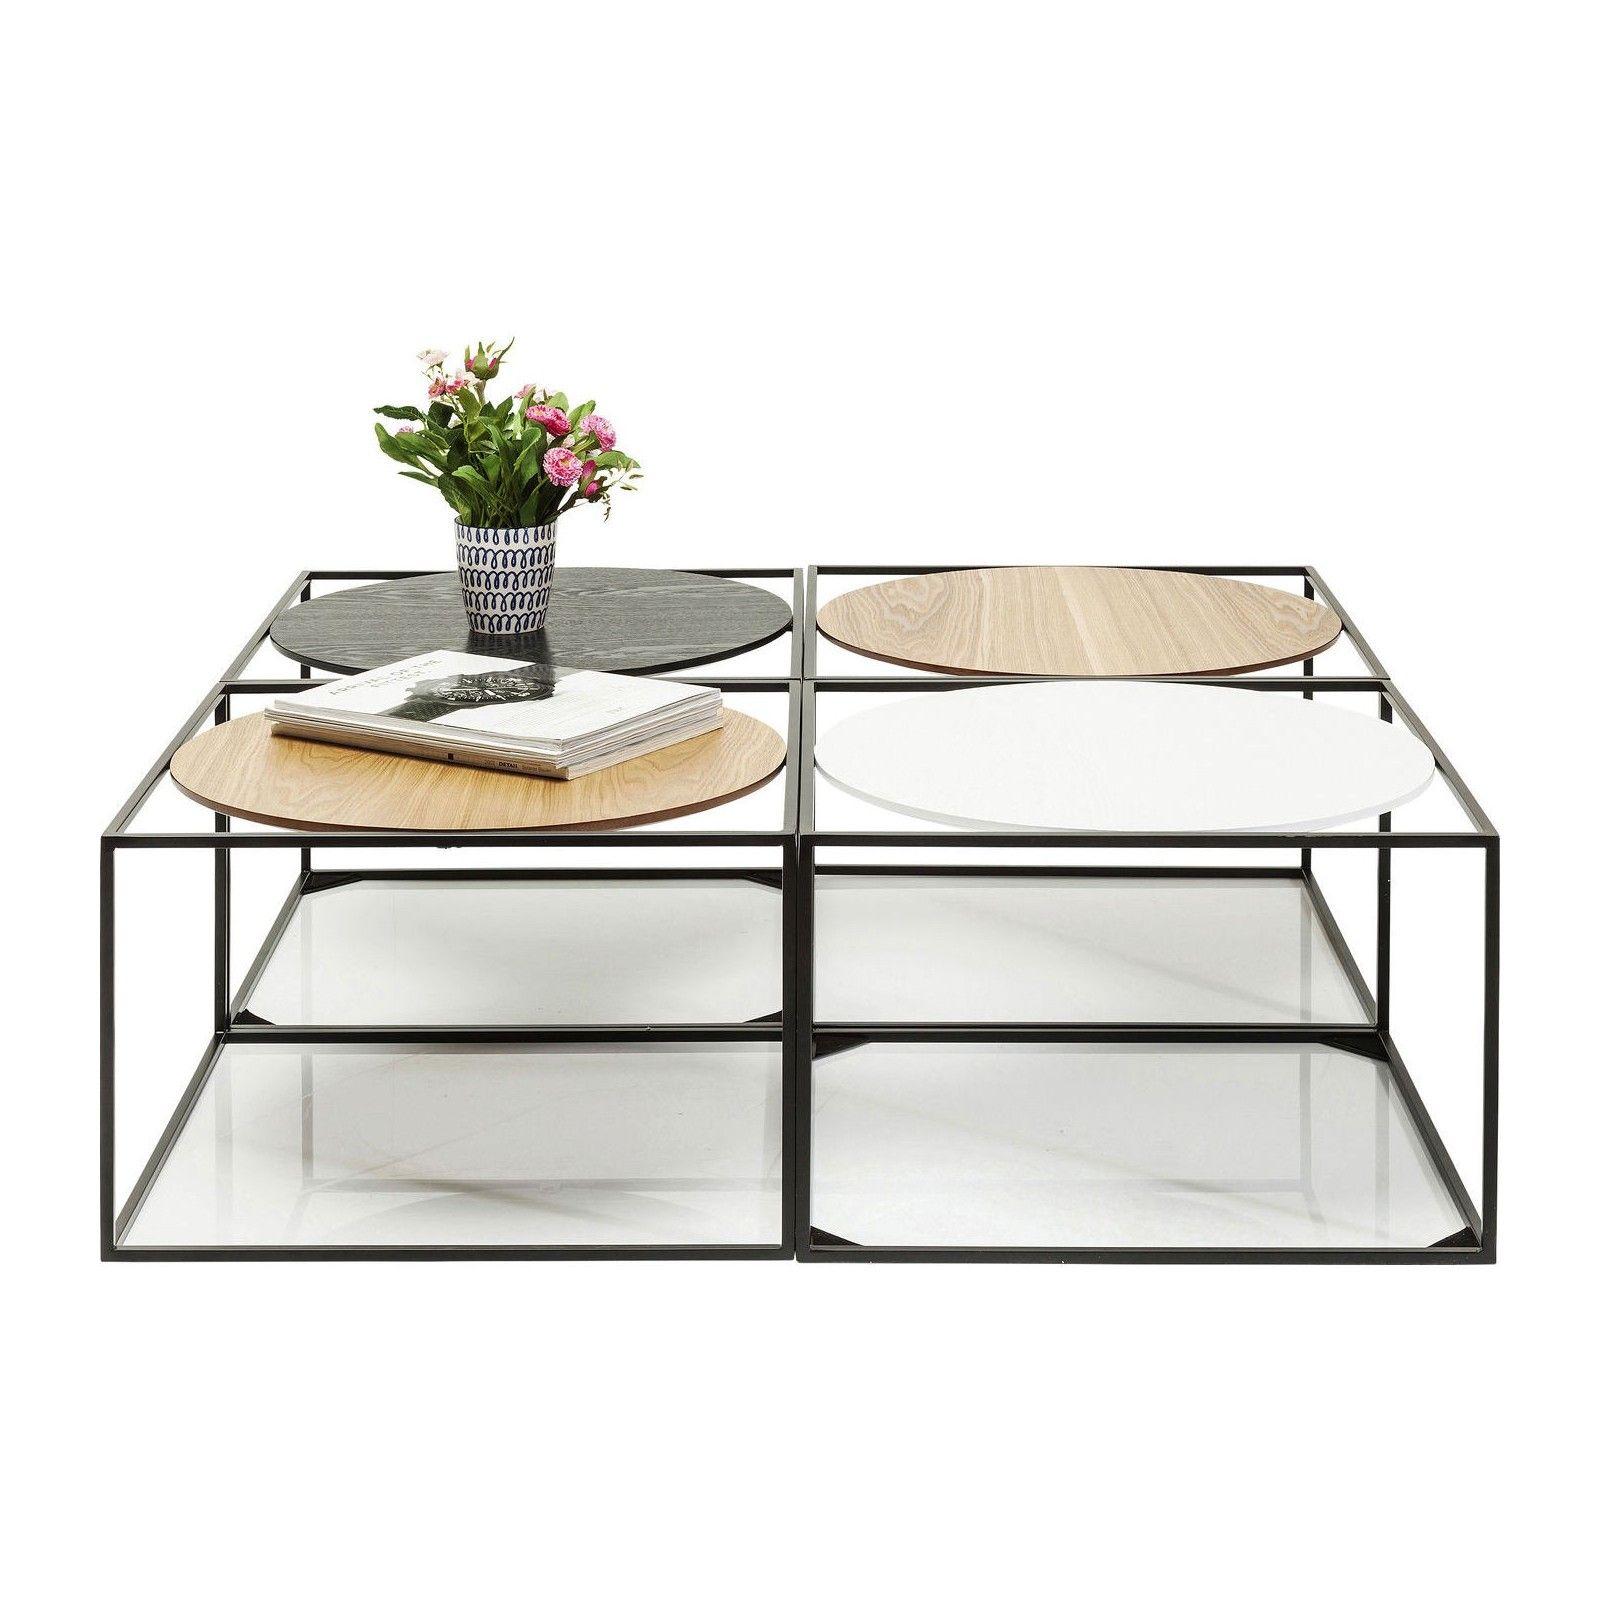 2d08adda8bf2436509725e8708cf4d8e Luxe De Table Basse En Cuir Schème